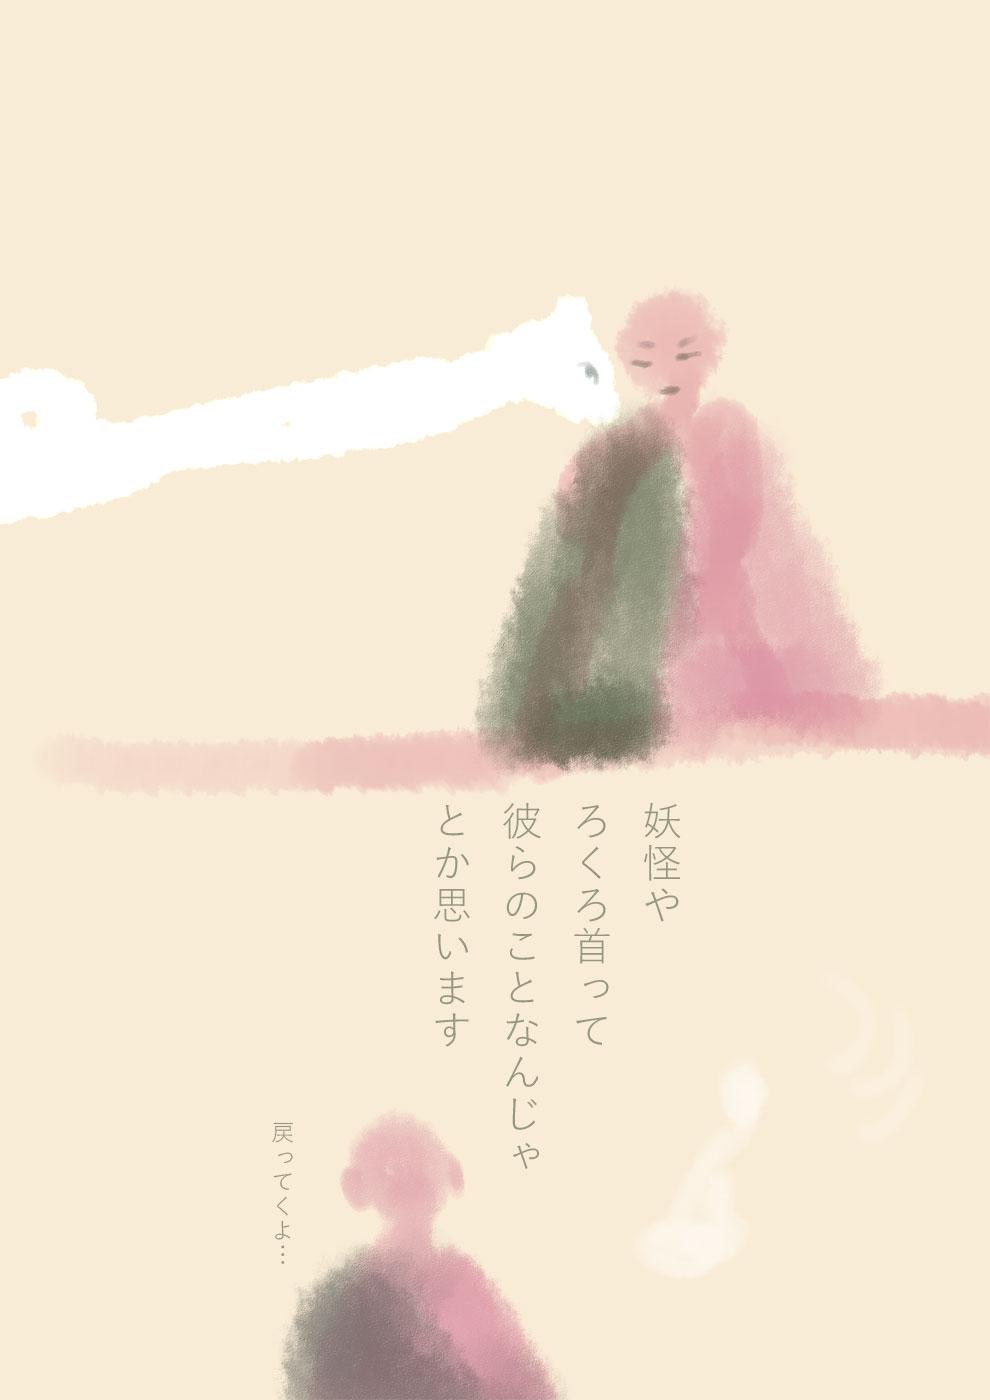 http://ahito.com/comic/ehon/kamiuta/img/2018/20180505_2/07.jpg